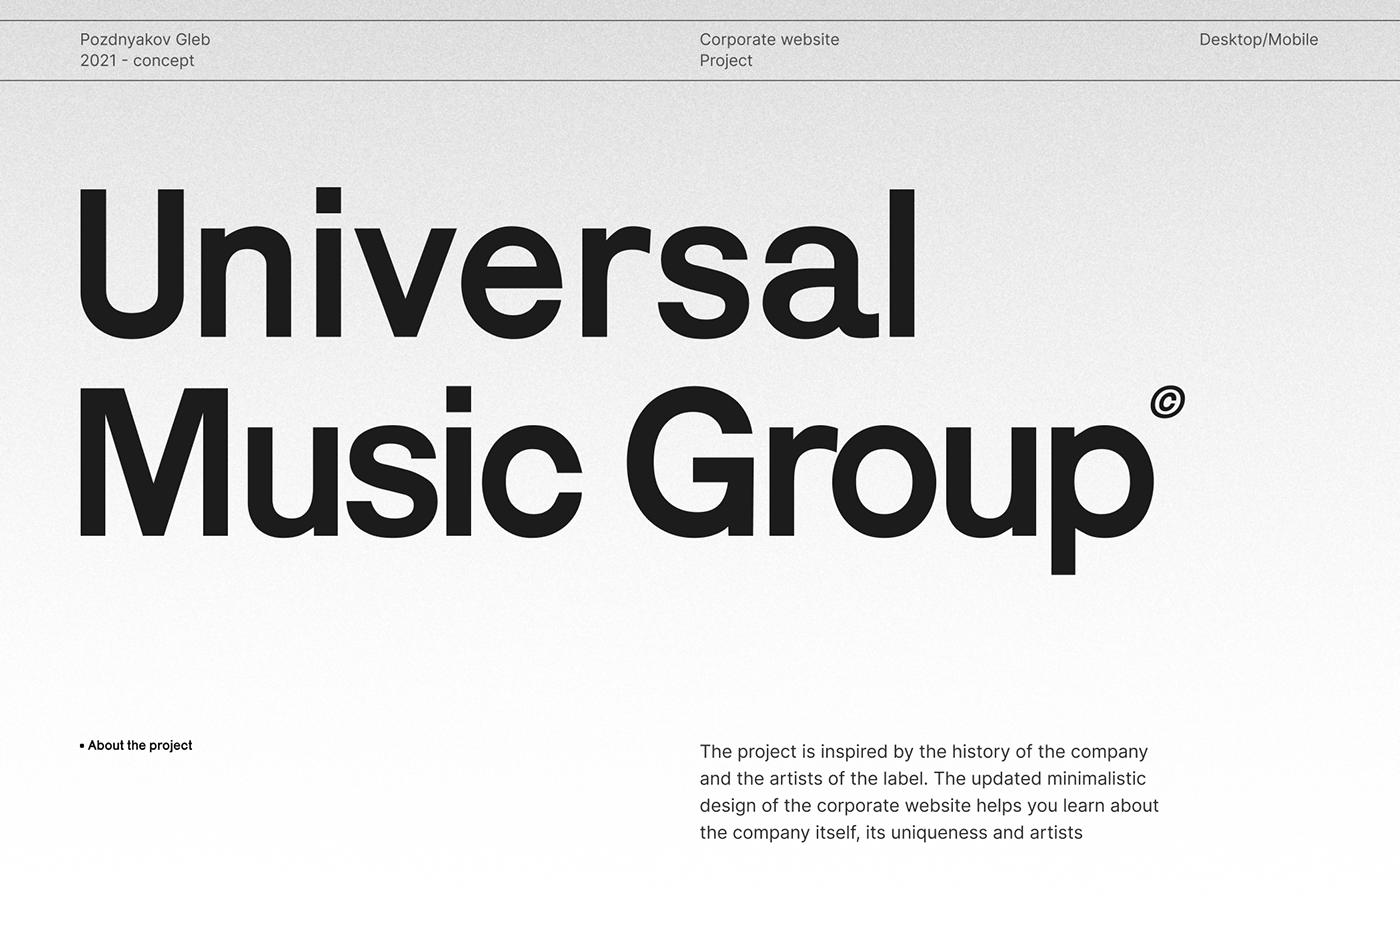 animation  concept corporate design grid Minimalism ux/ui Web